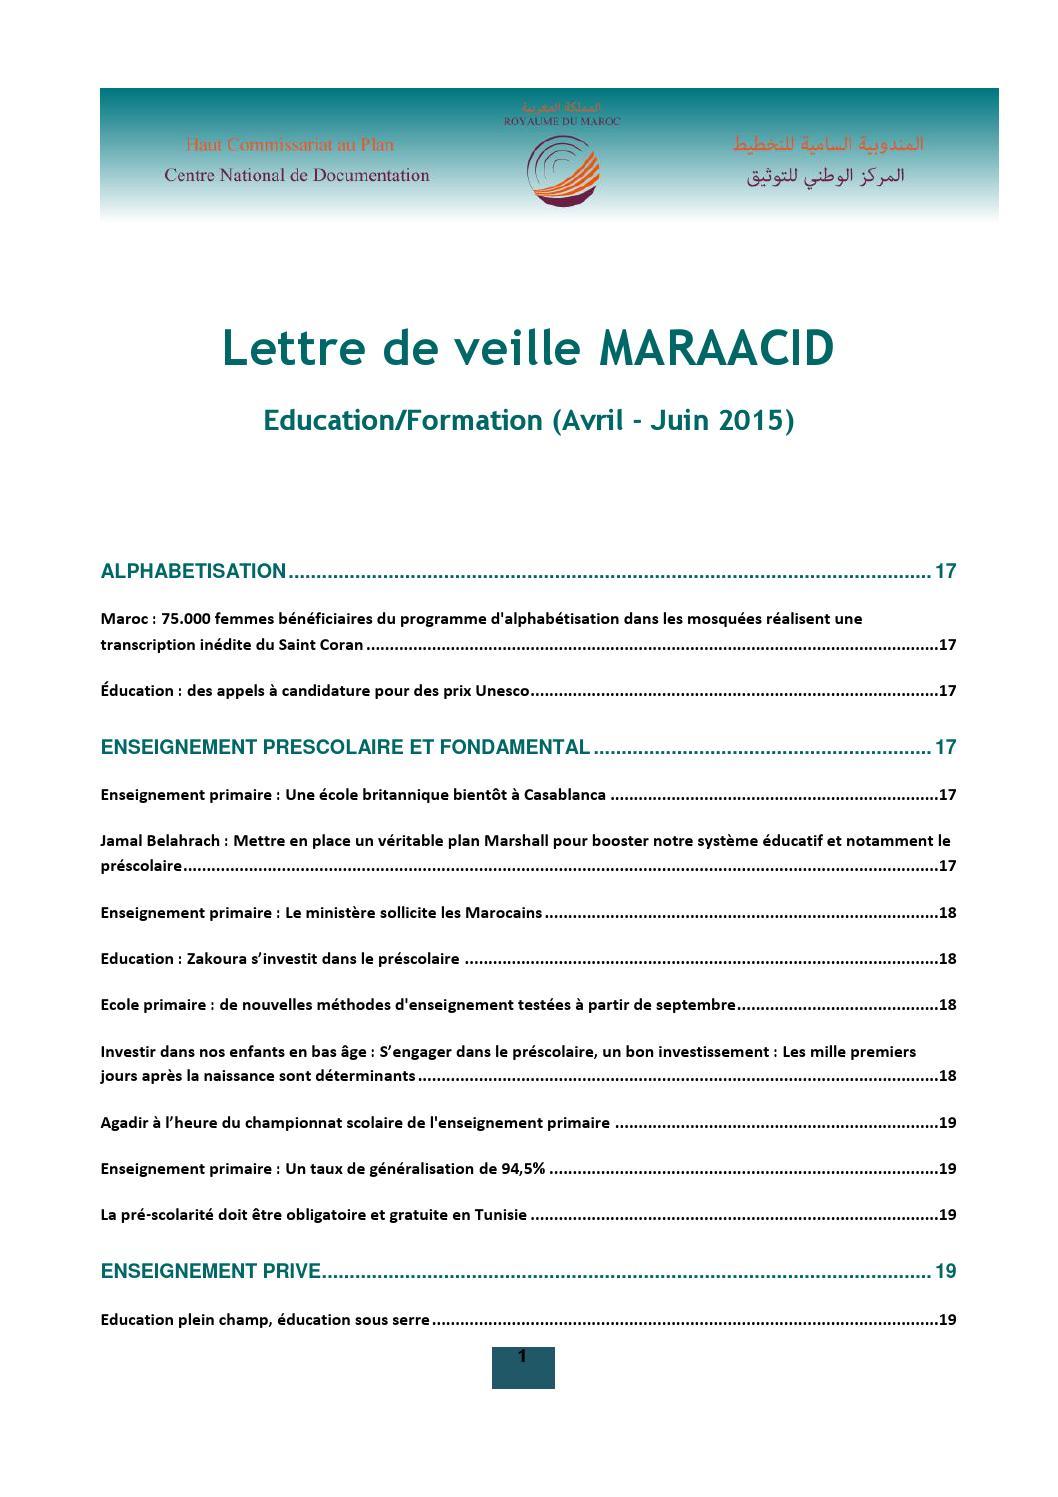 Lettre De Veille Cnd Education Formation Avril Juin 2015 By Cnd